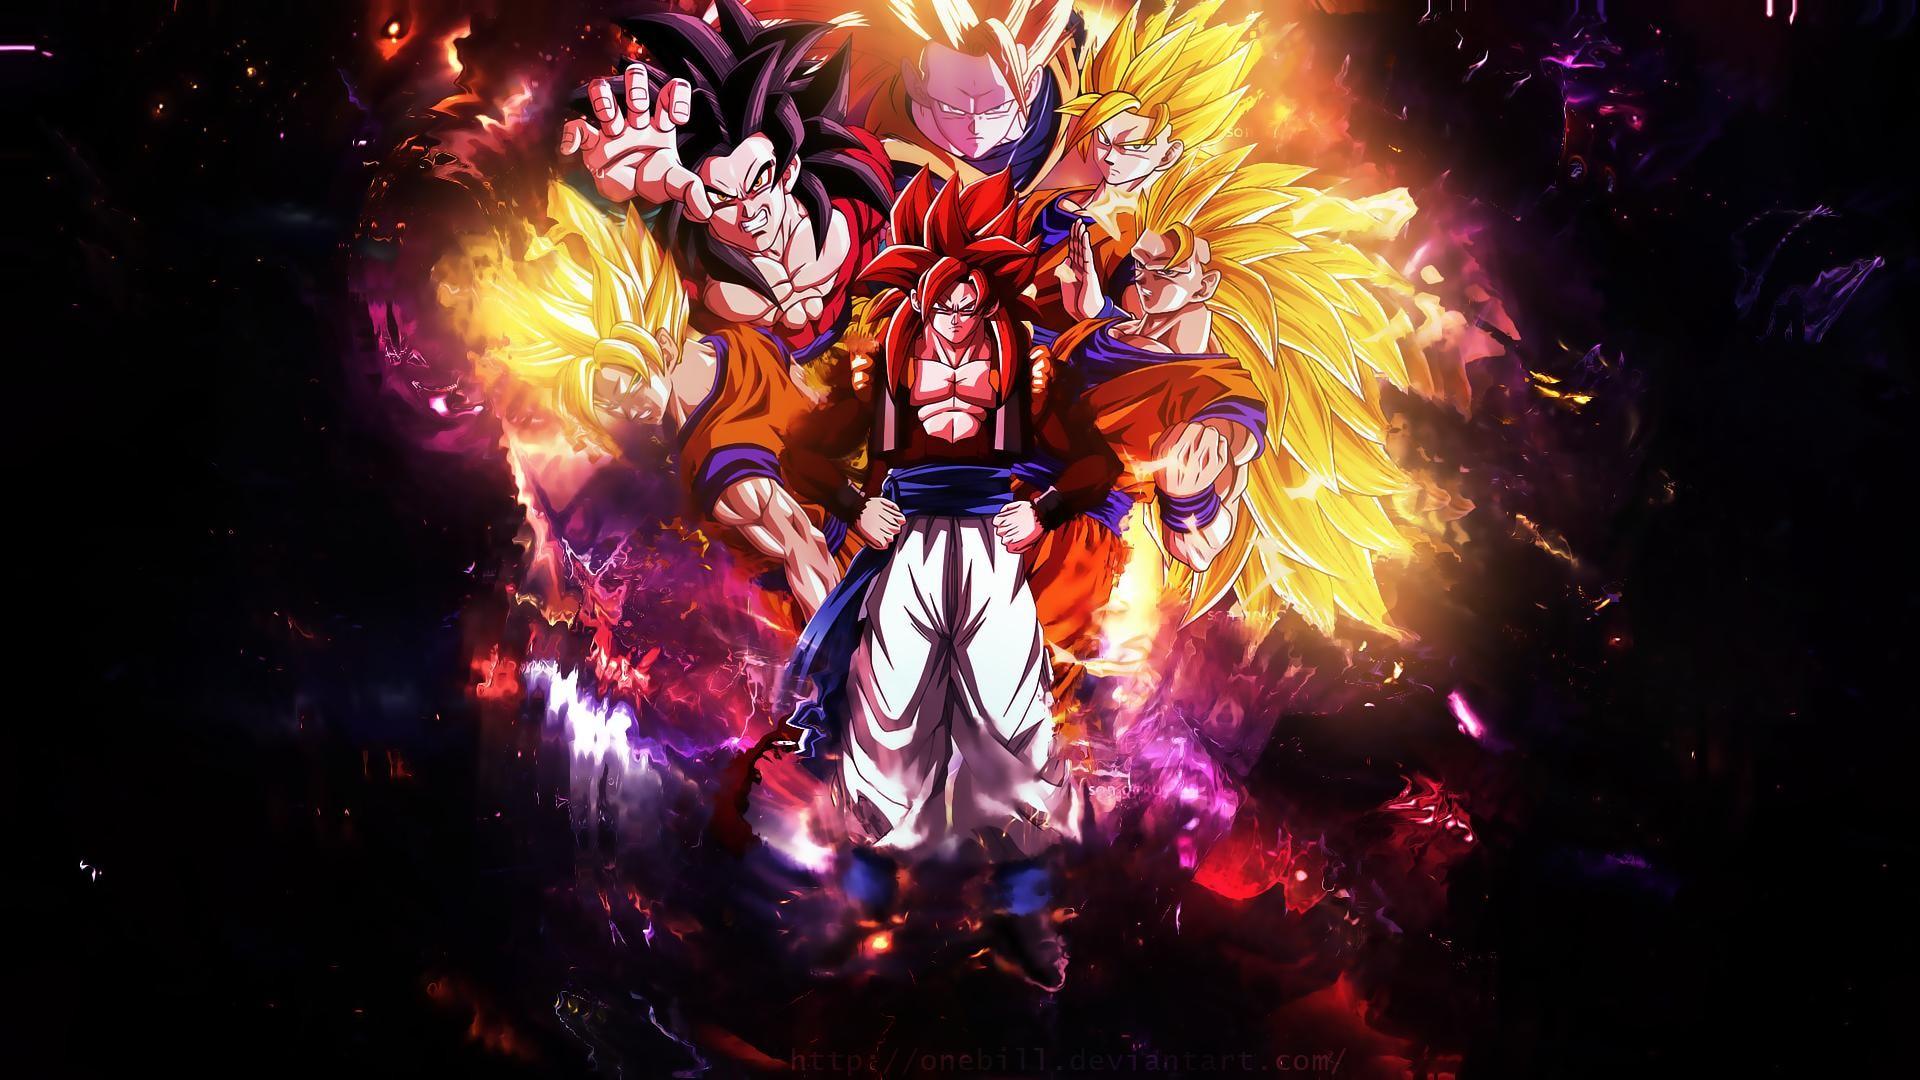 Dragon Ball Super Live Wallpaper Iphone X Dragon Ball Goku Wallpaper 70 Images